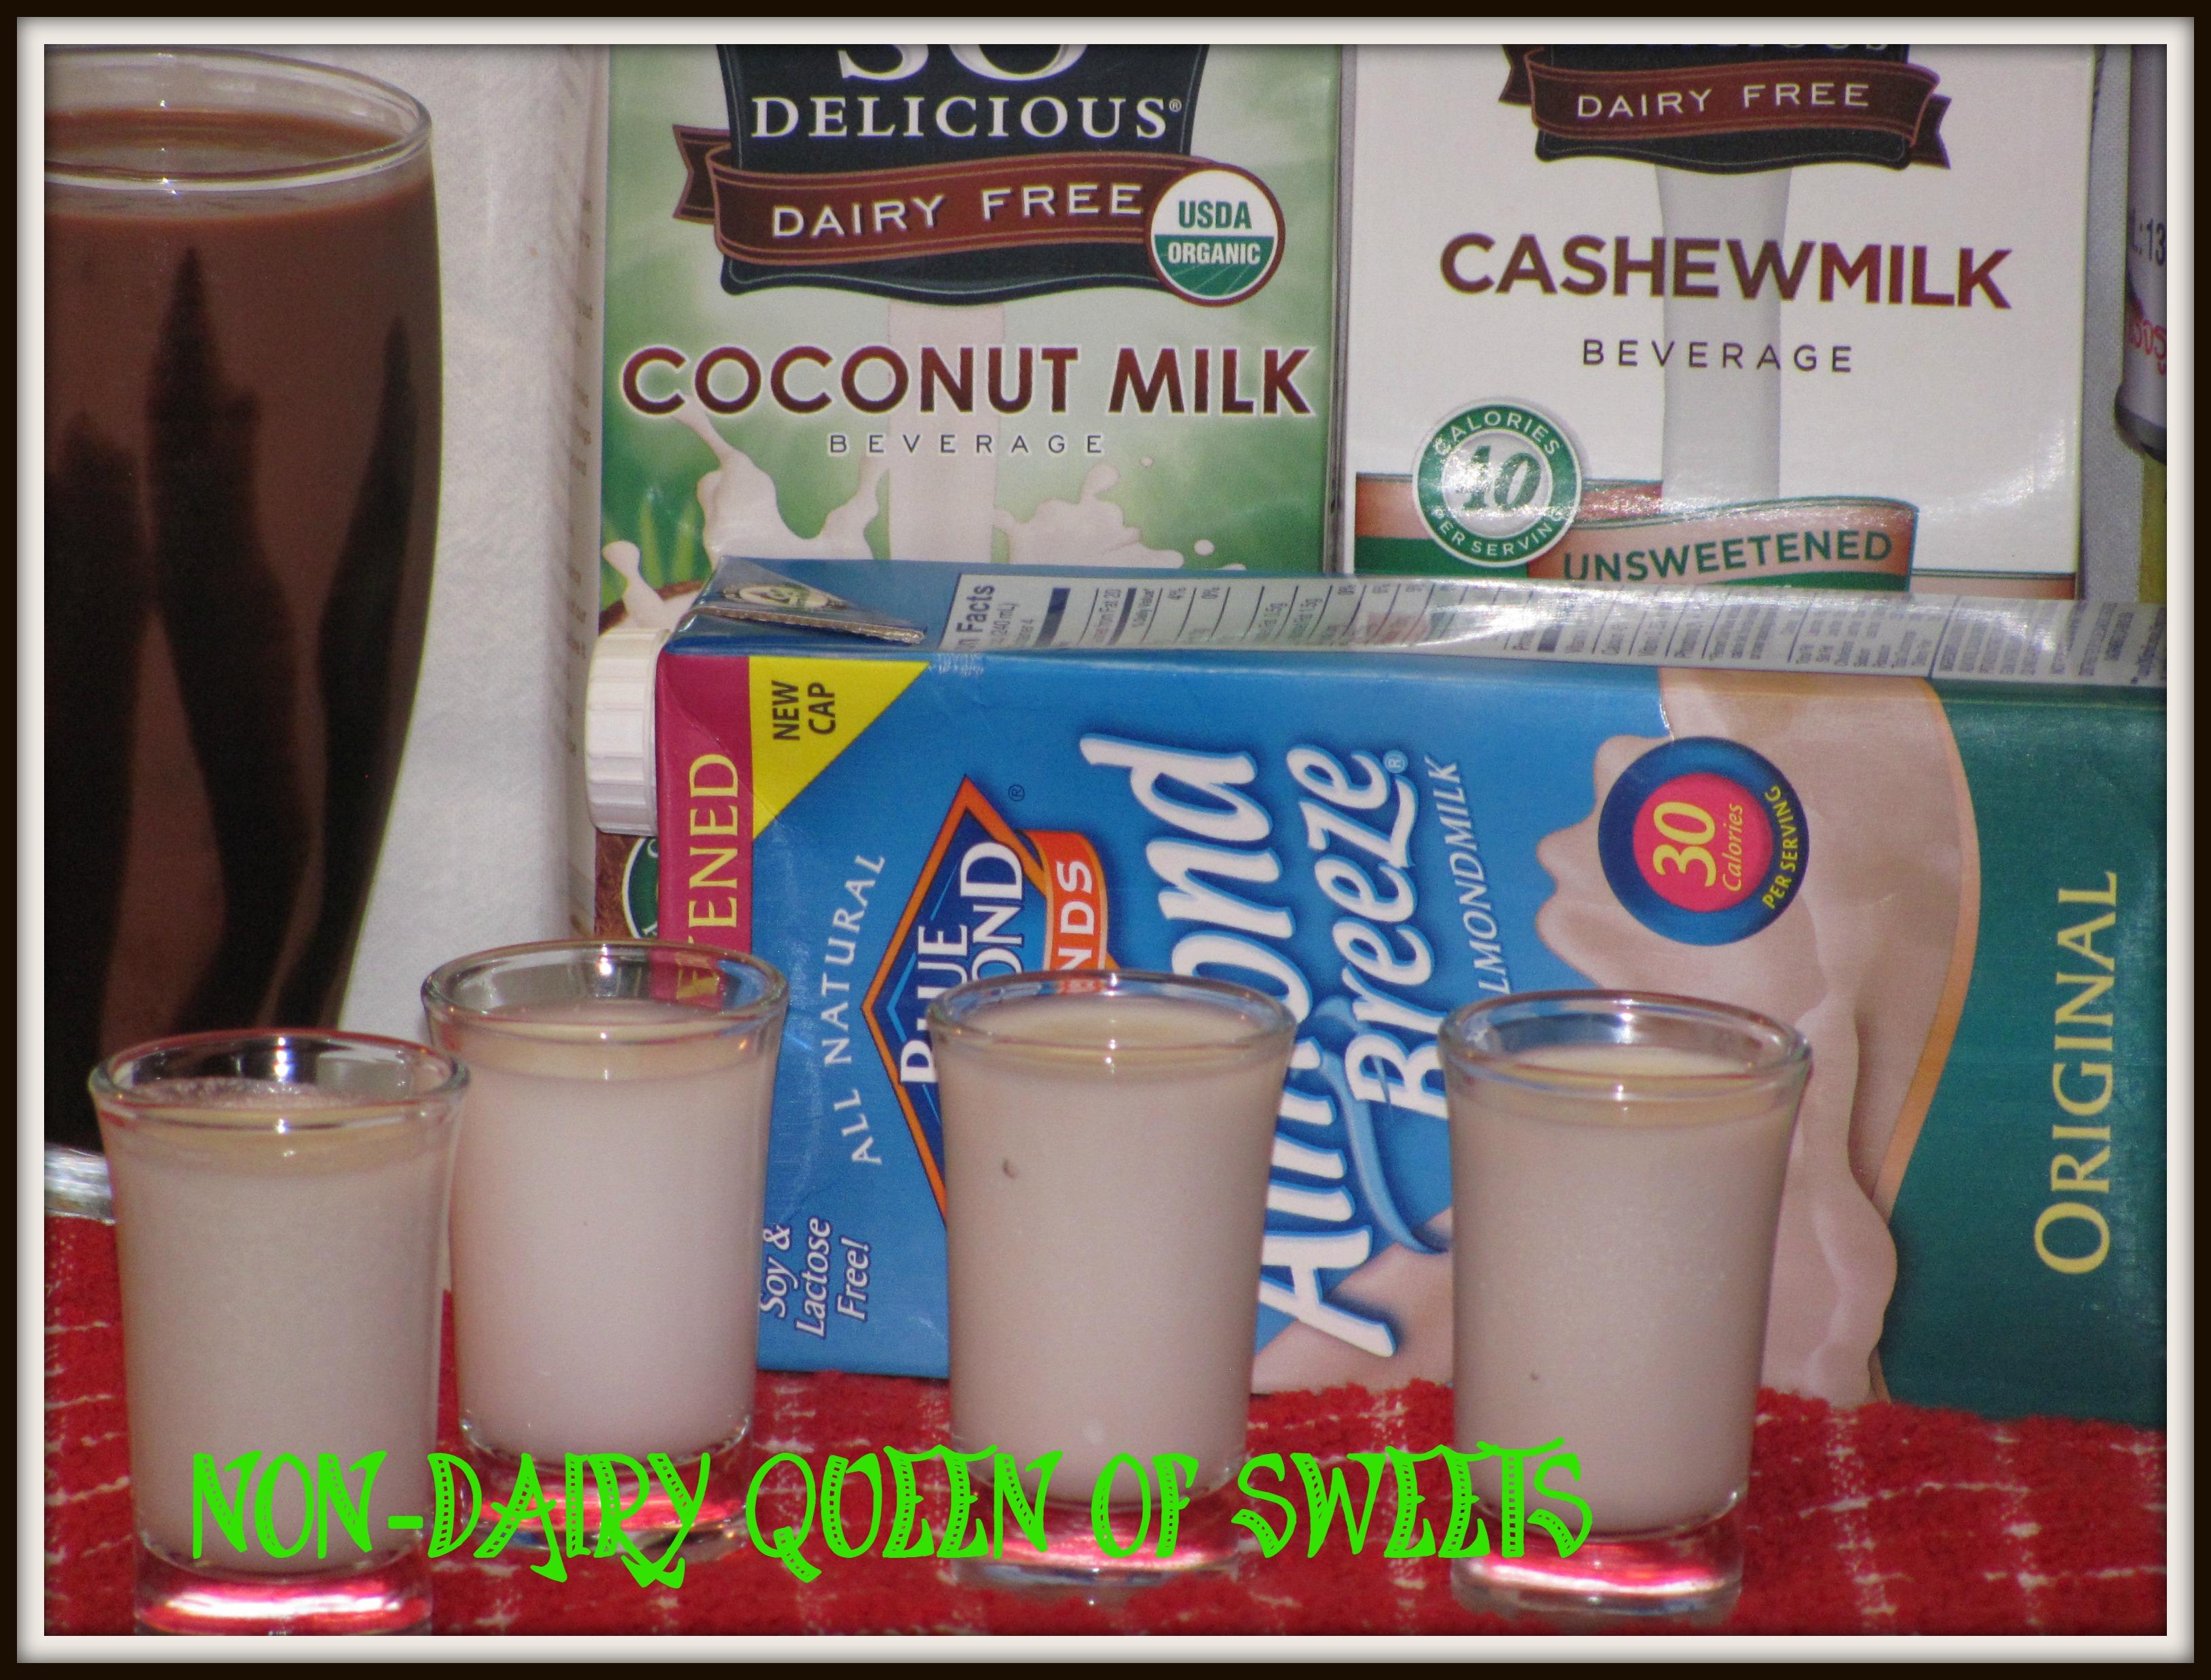 almond milk – nondairyqueenofsweets